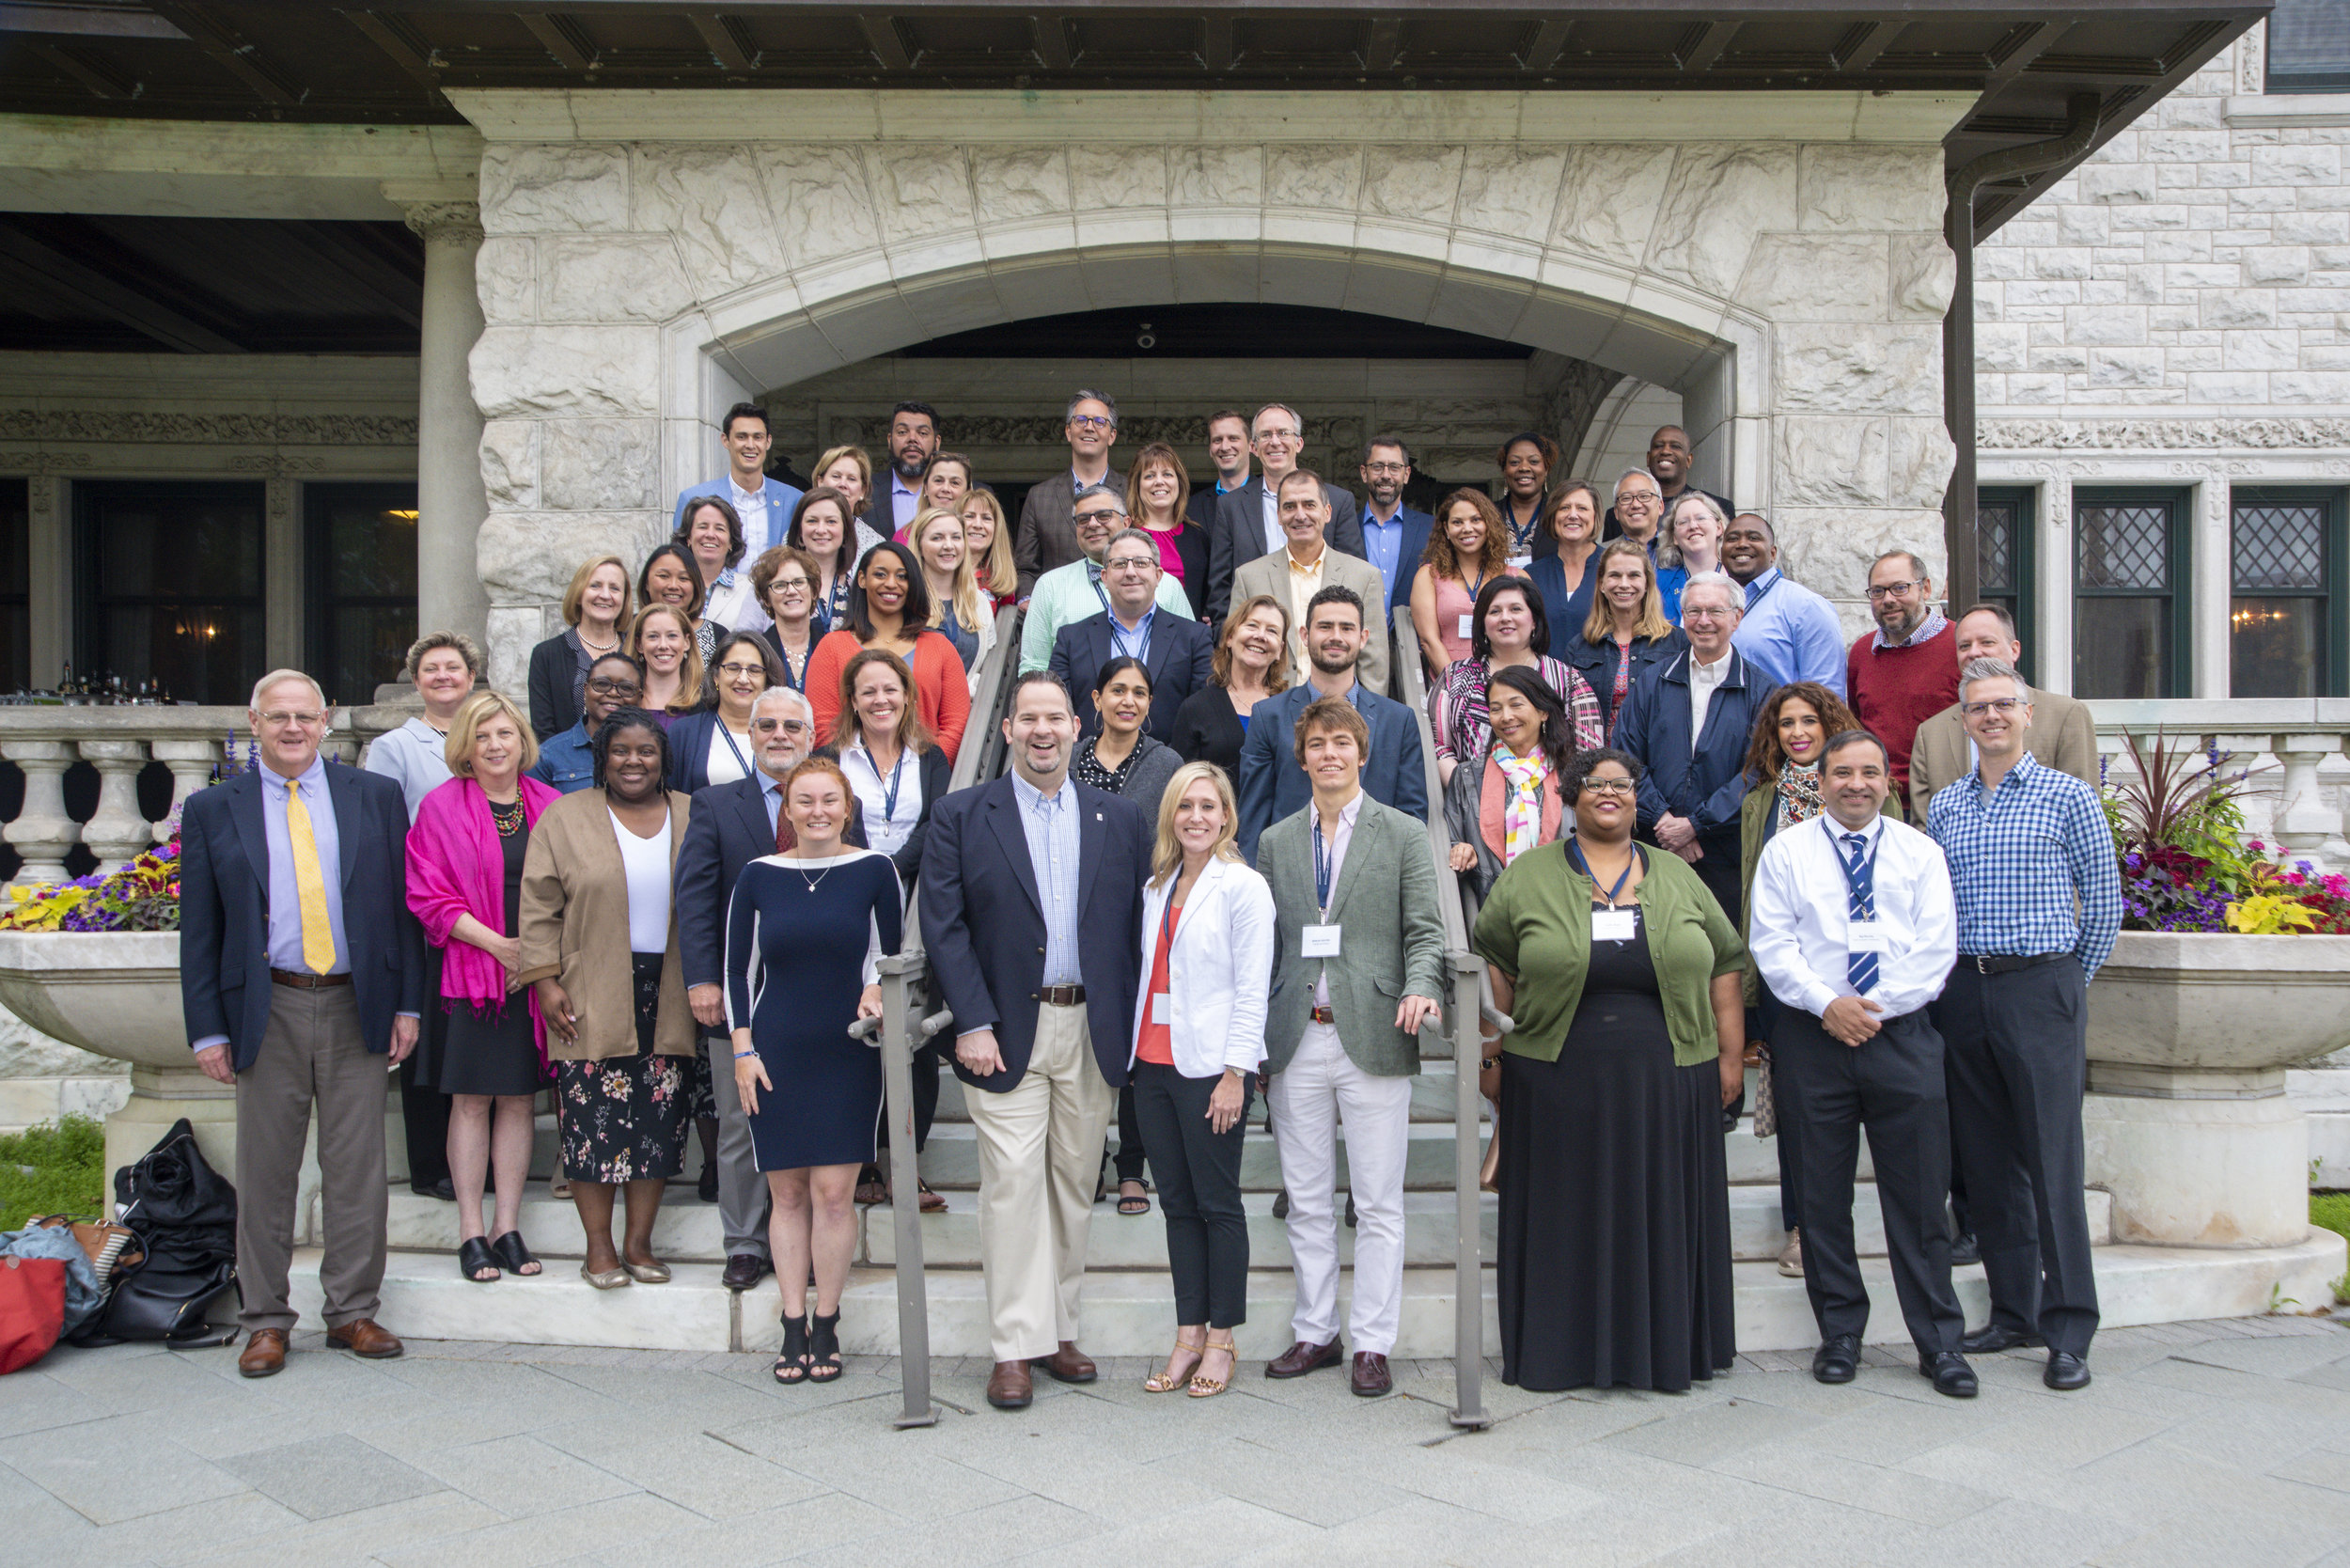 2019 Jesuit Leadership Seminar Participants (Photo by Glenn Kaupert Photography)